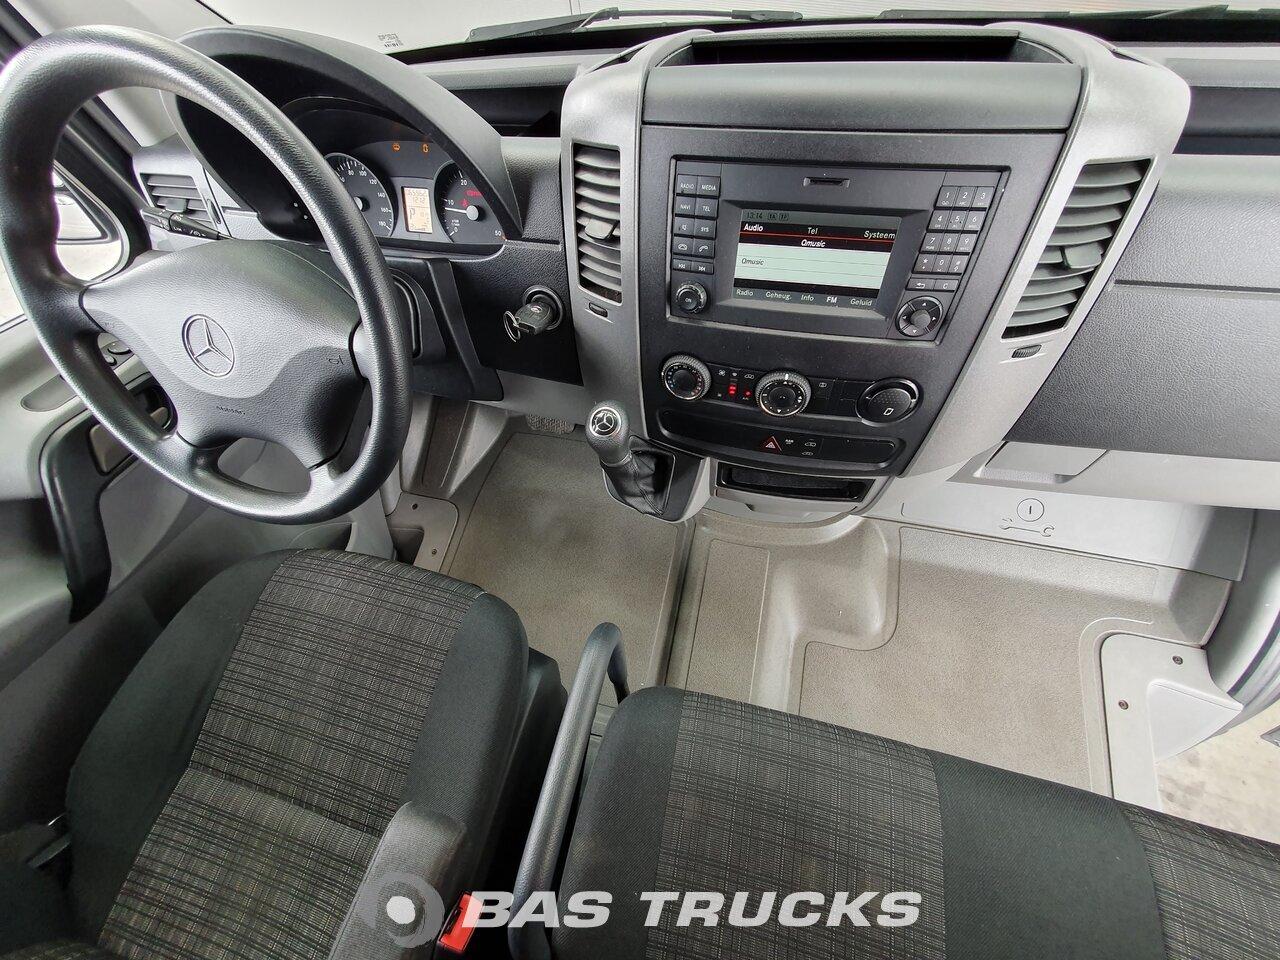 For sale at BAS Trucks: Mercedes Sprinter 07/2014